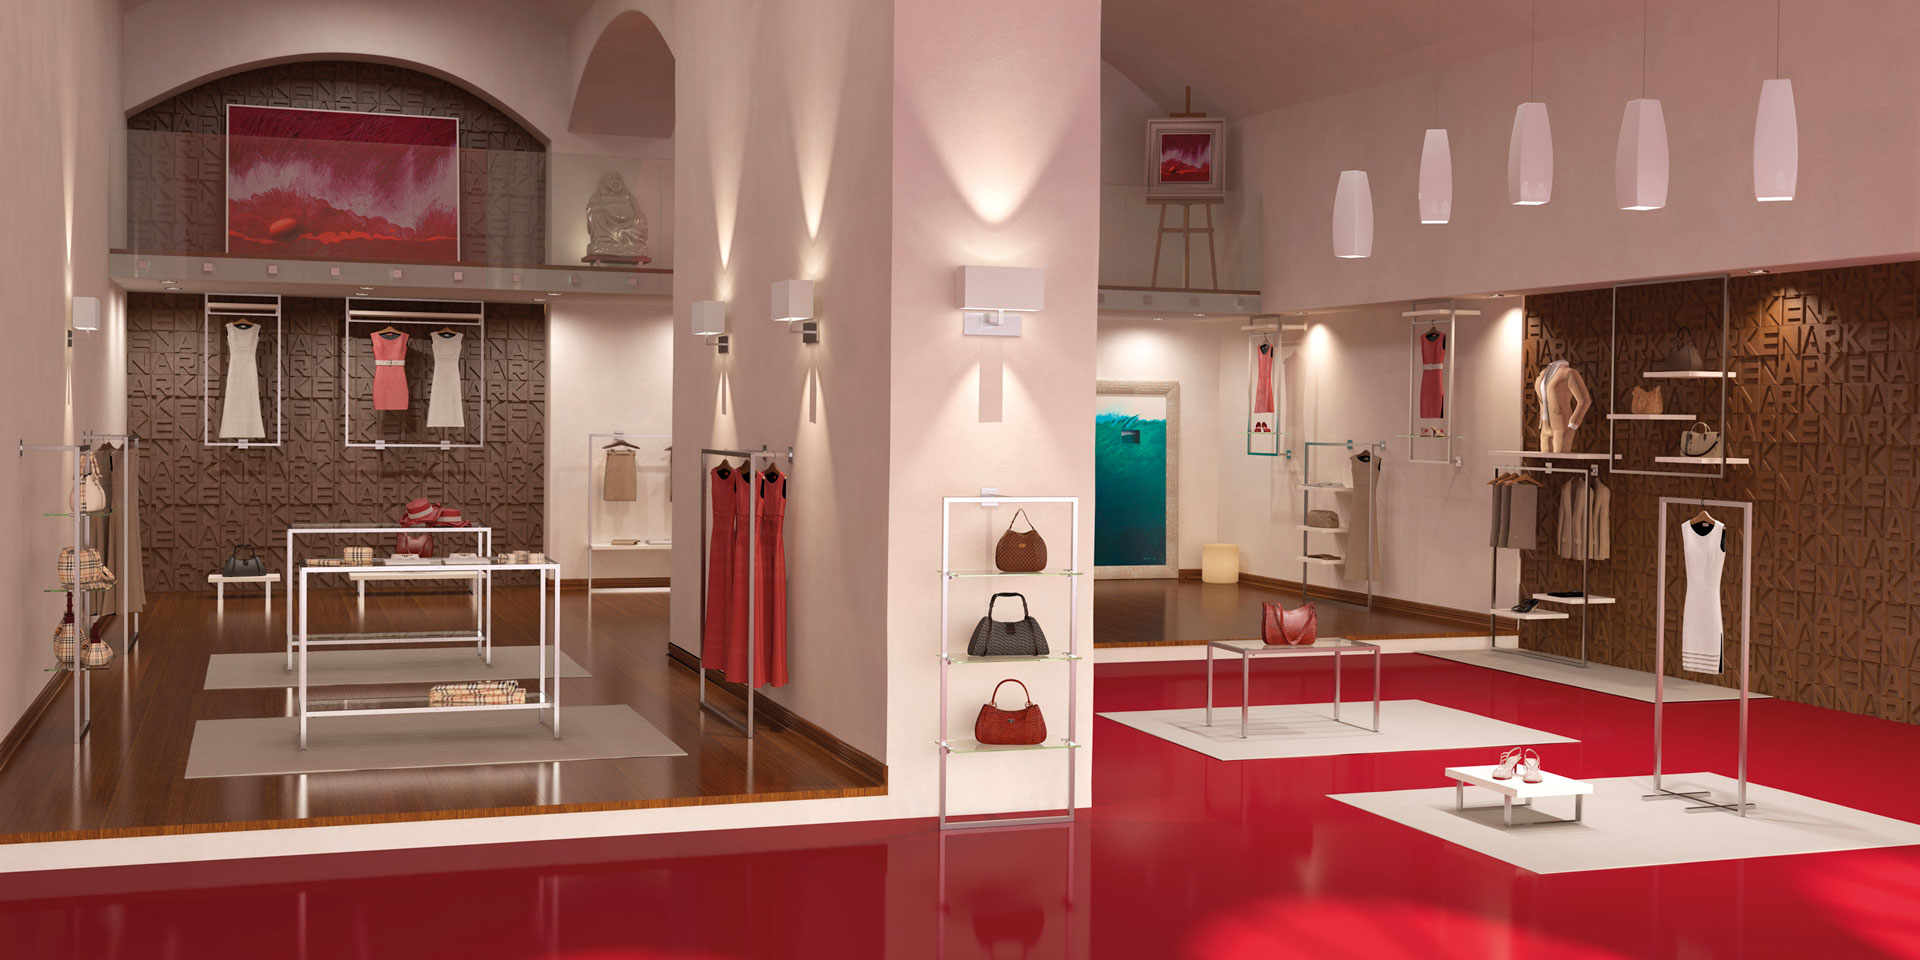 arredamento negozi verona - la vetrina italia - arredamenti e ... - Arredamento Negozio Abbigliamento Yahoo